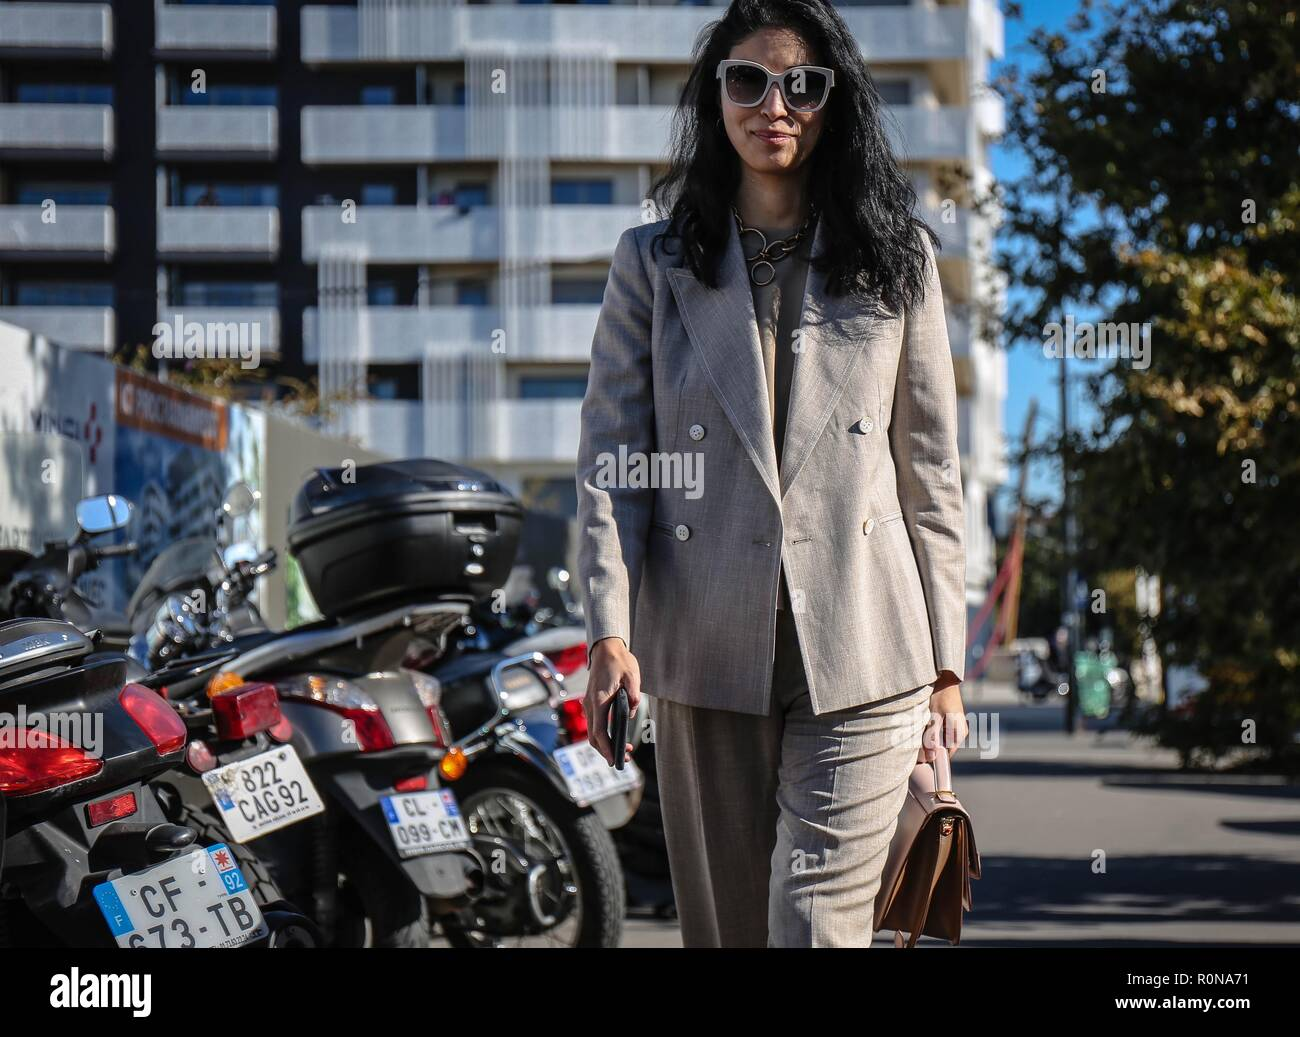 PARIS, France- September 30 2018: Caroline Issa on the street during the Paris Fashion Week. Stock Photo